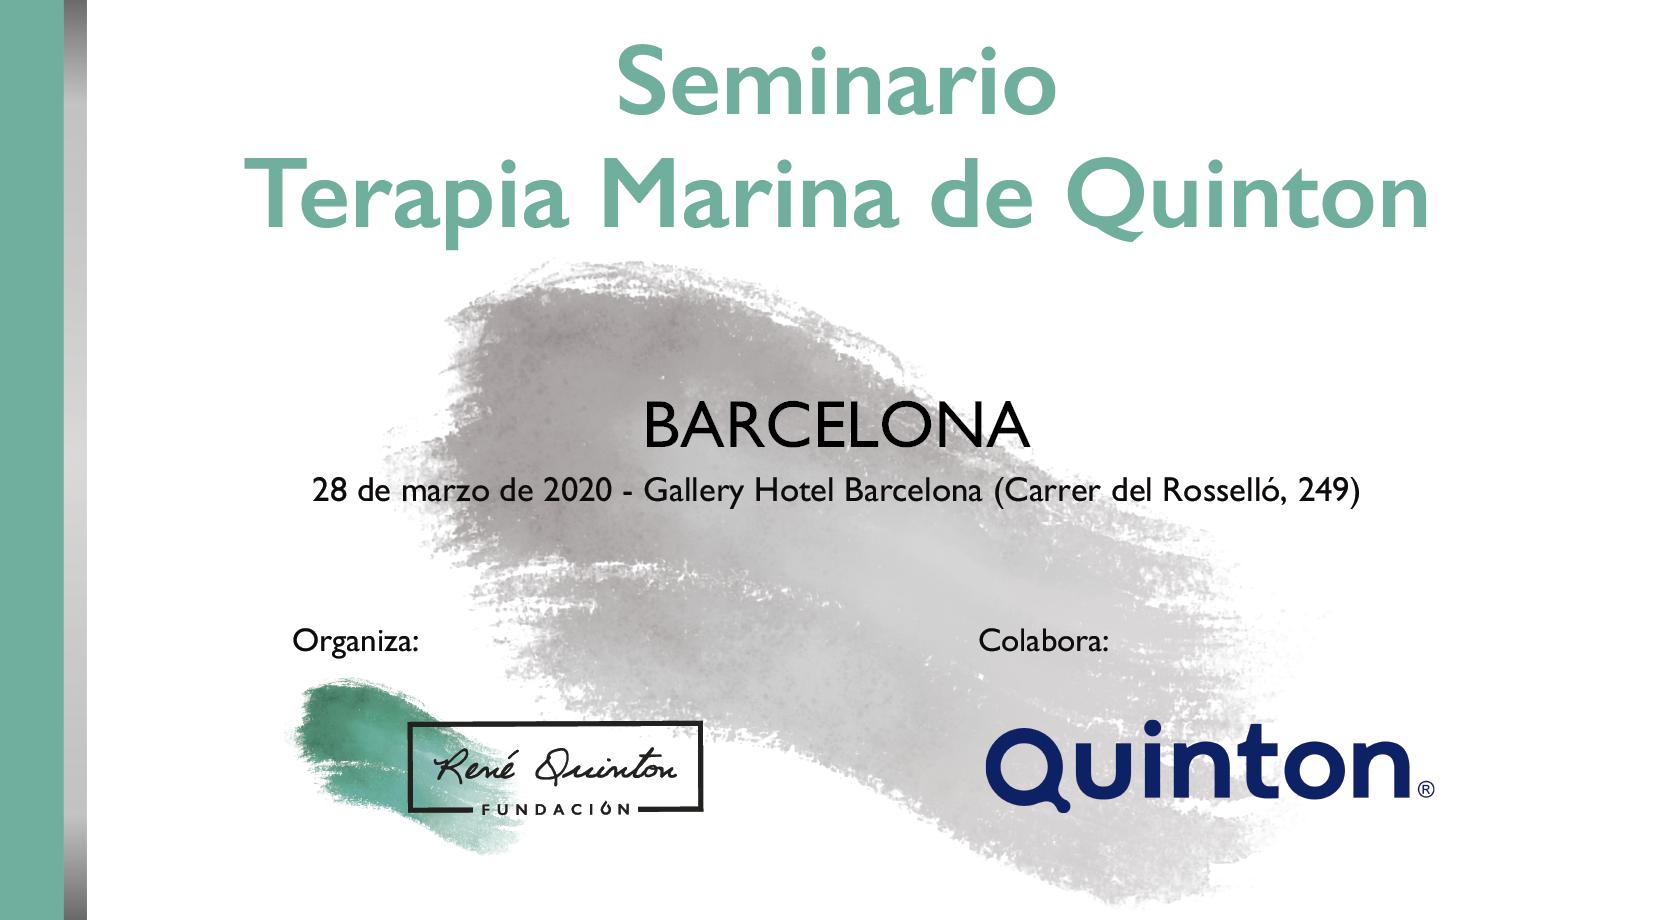 Seminario_BCN_2020_Cartel